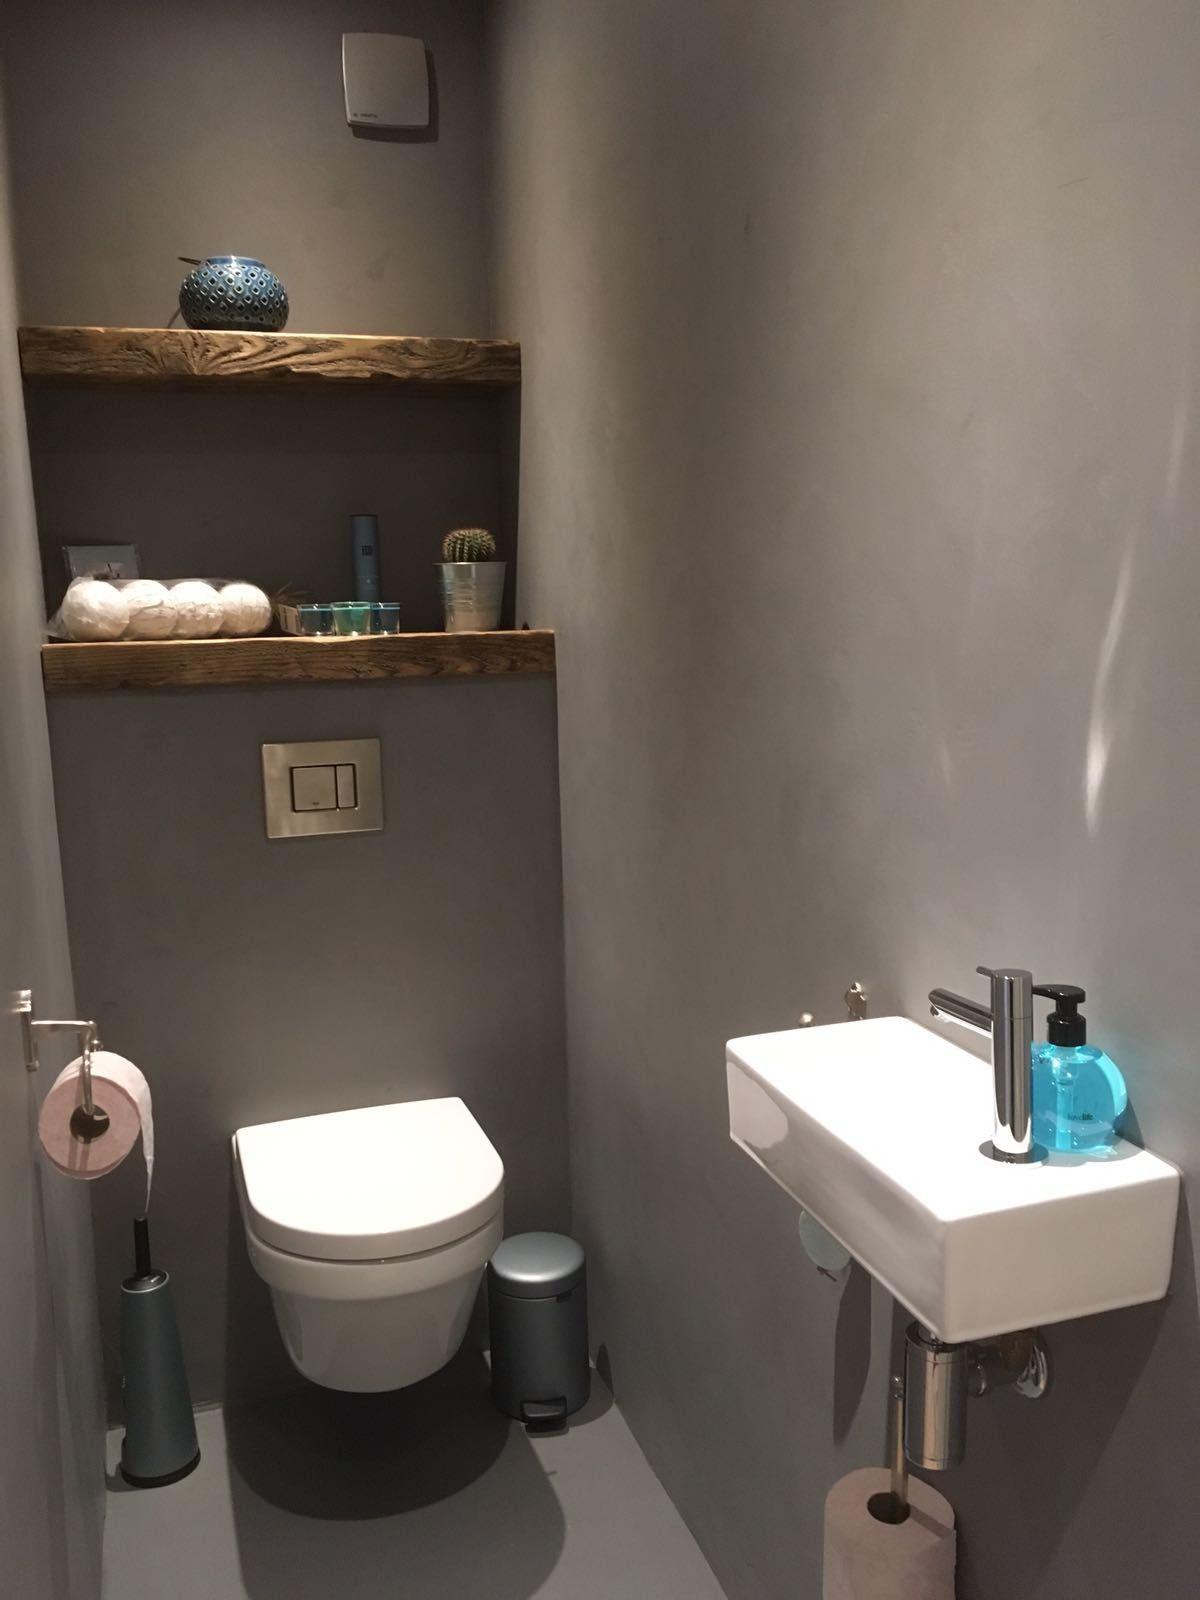 Betoncire Betonstuc Toilet Wc Steigerhout Deco In 2019